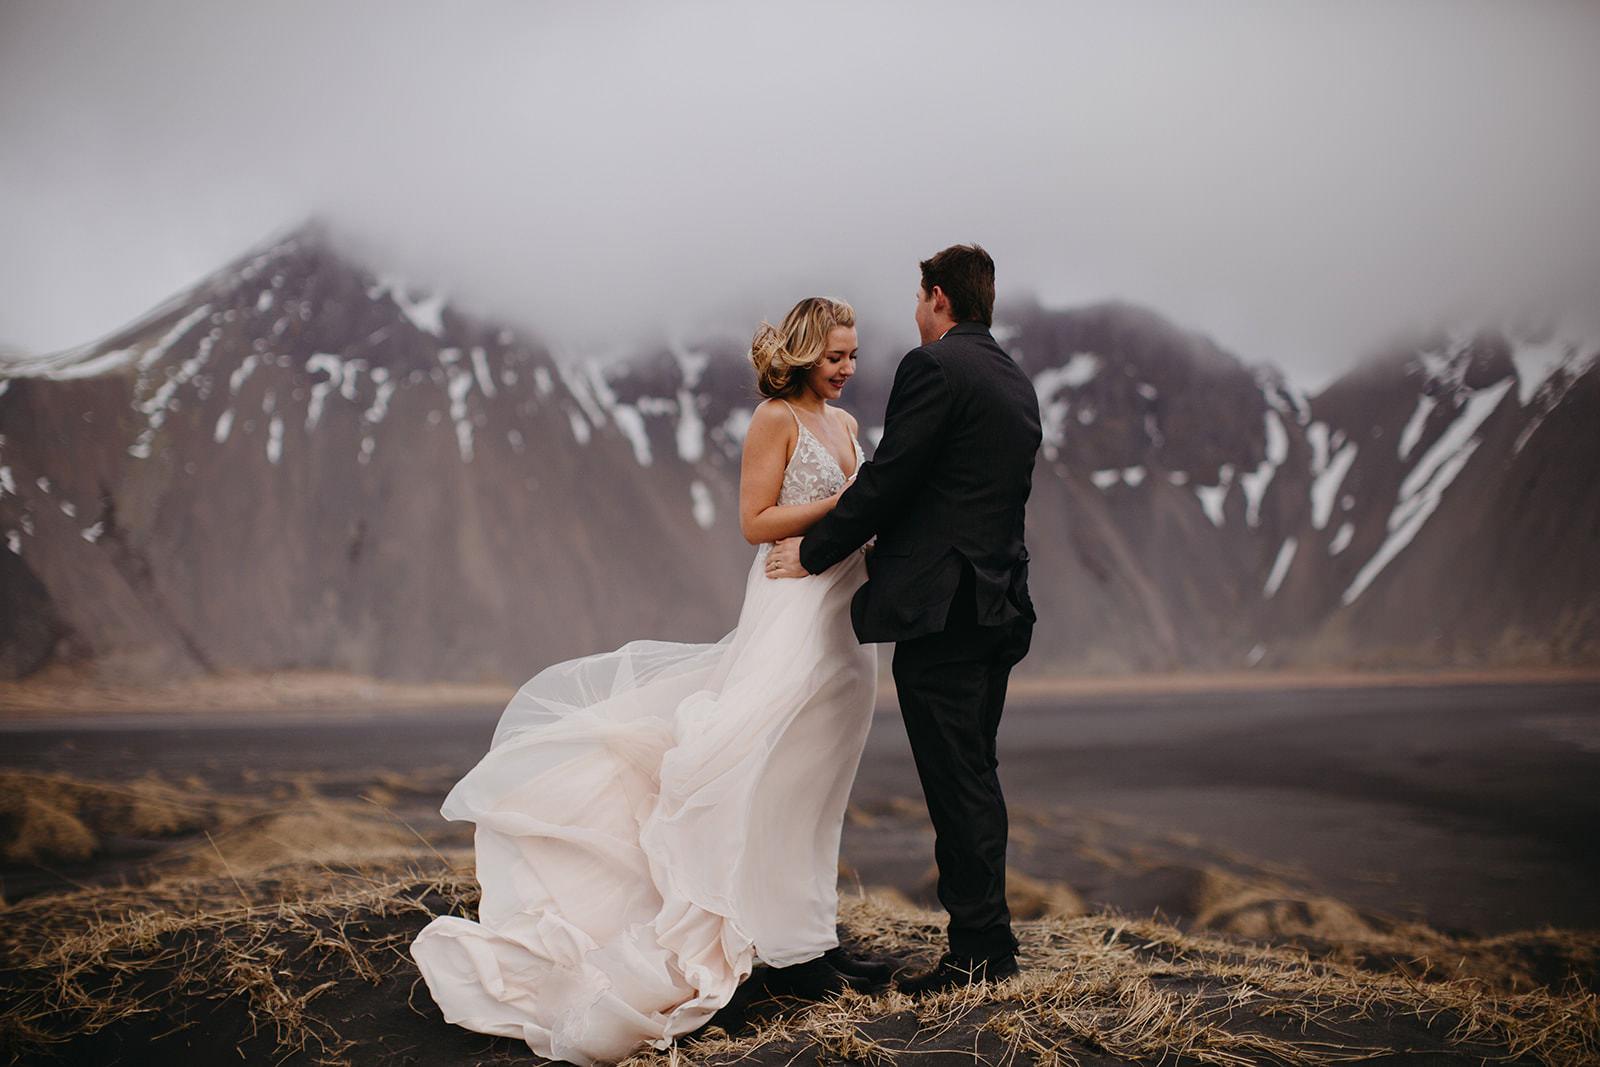 Icelandic Iceland Elopement Wedding Elope Photographer Eloping Reykjavík Vik Black Sand Beach Jökulsárlón Skogafoss Waterfall Vestrahorn Mountain Liz Osban Photography Destination 26.jpg